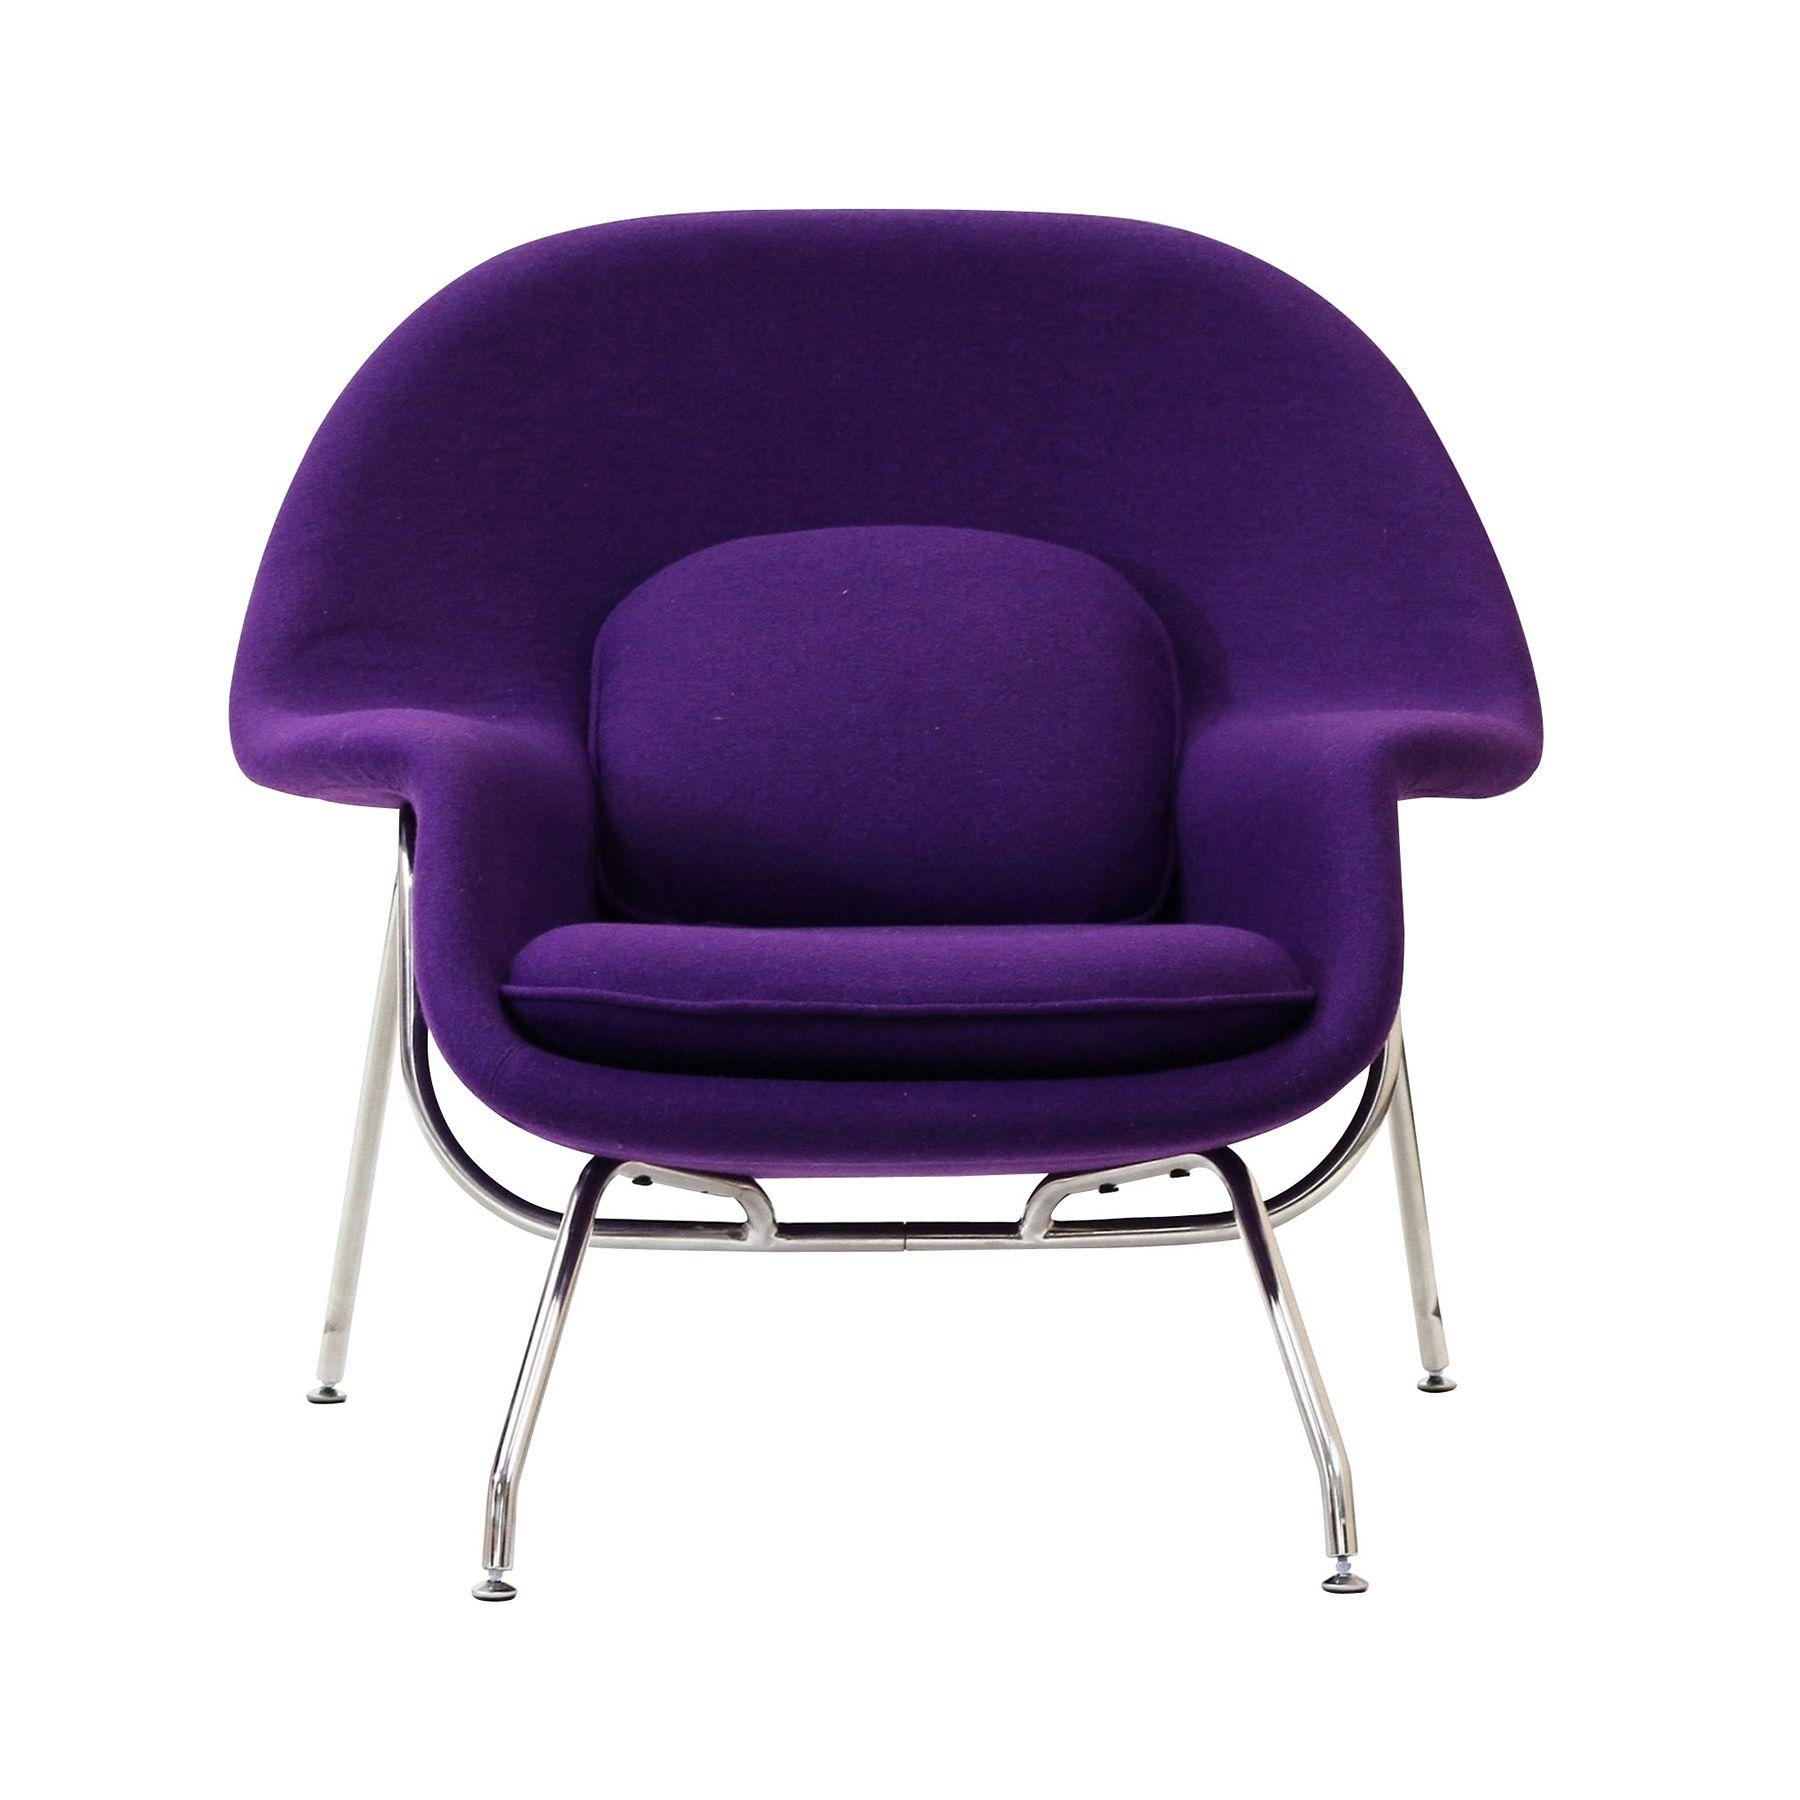 LexMod Eero Saarinen Style Womb Chair and Ottoman Set in Purple